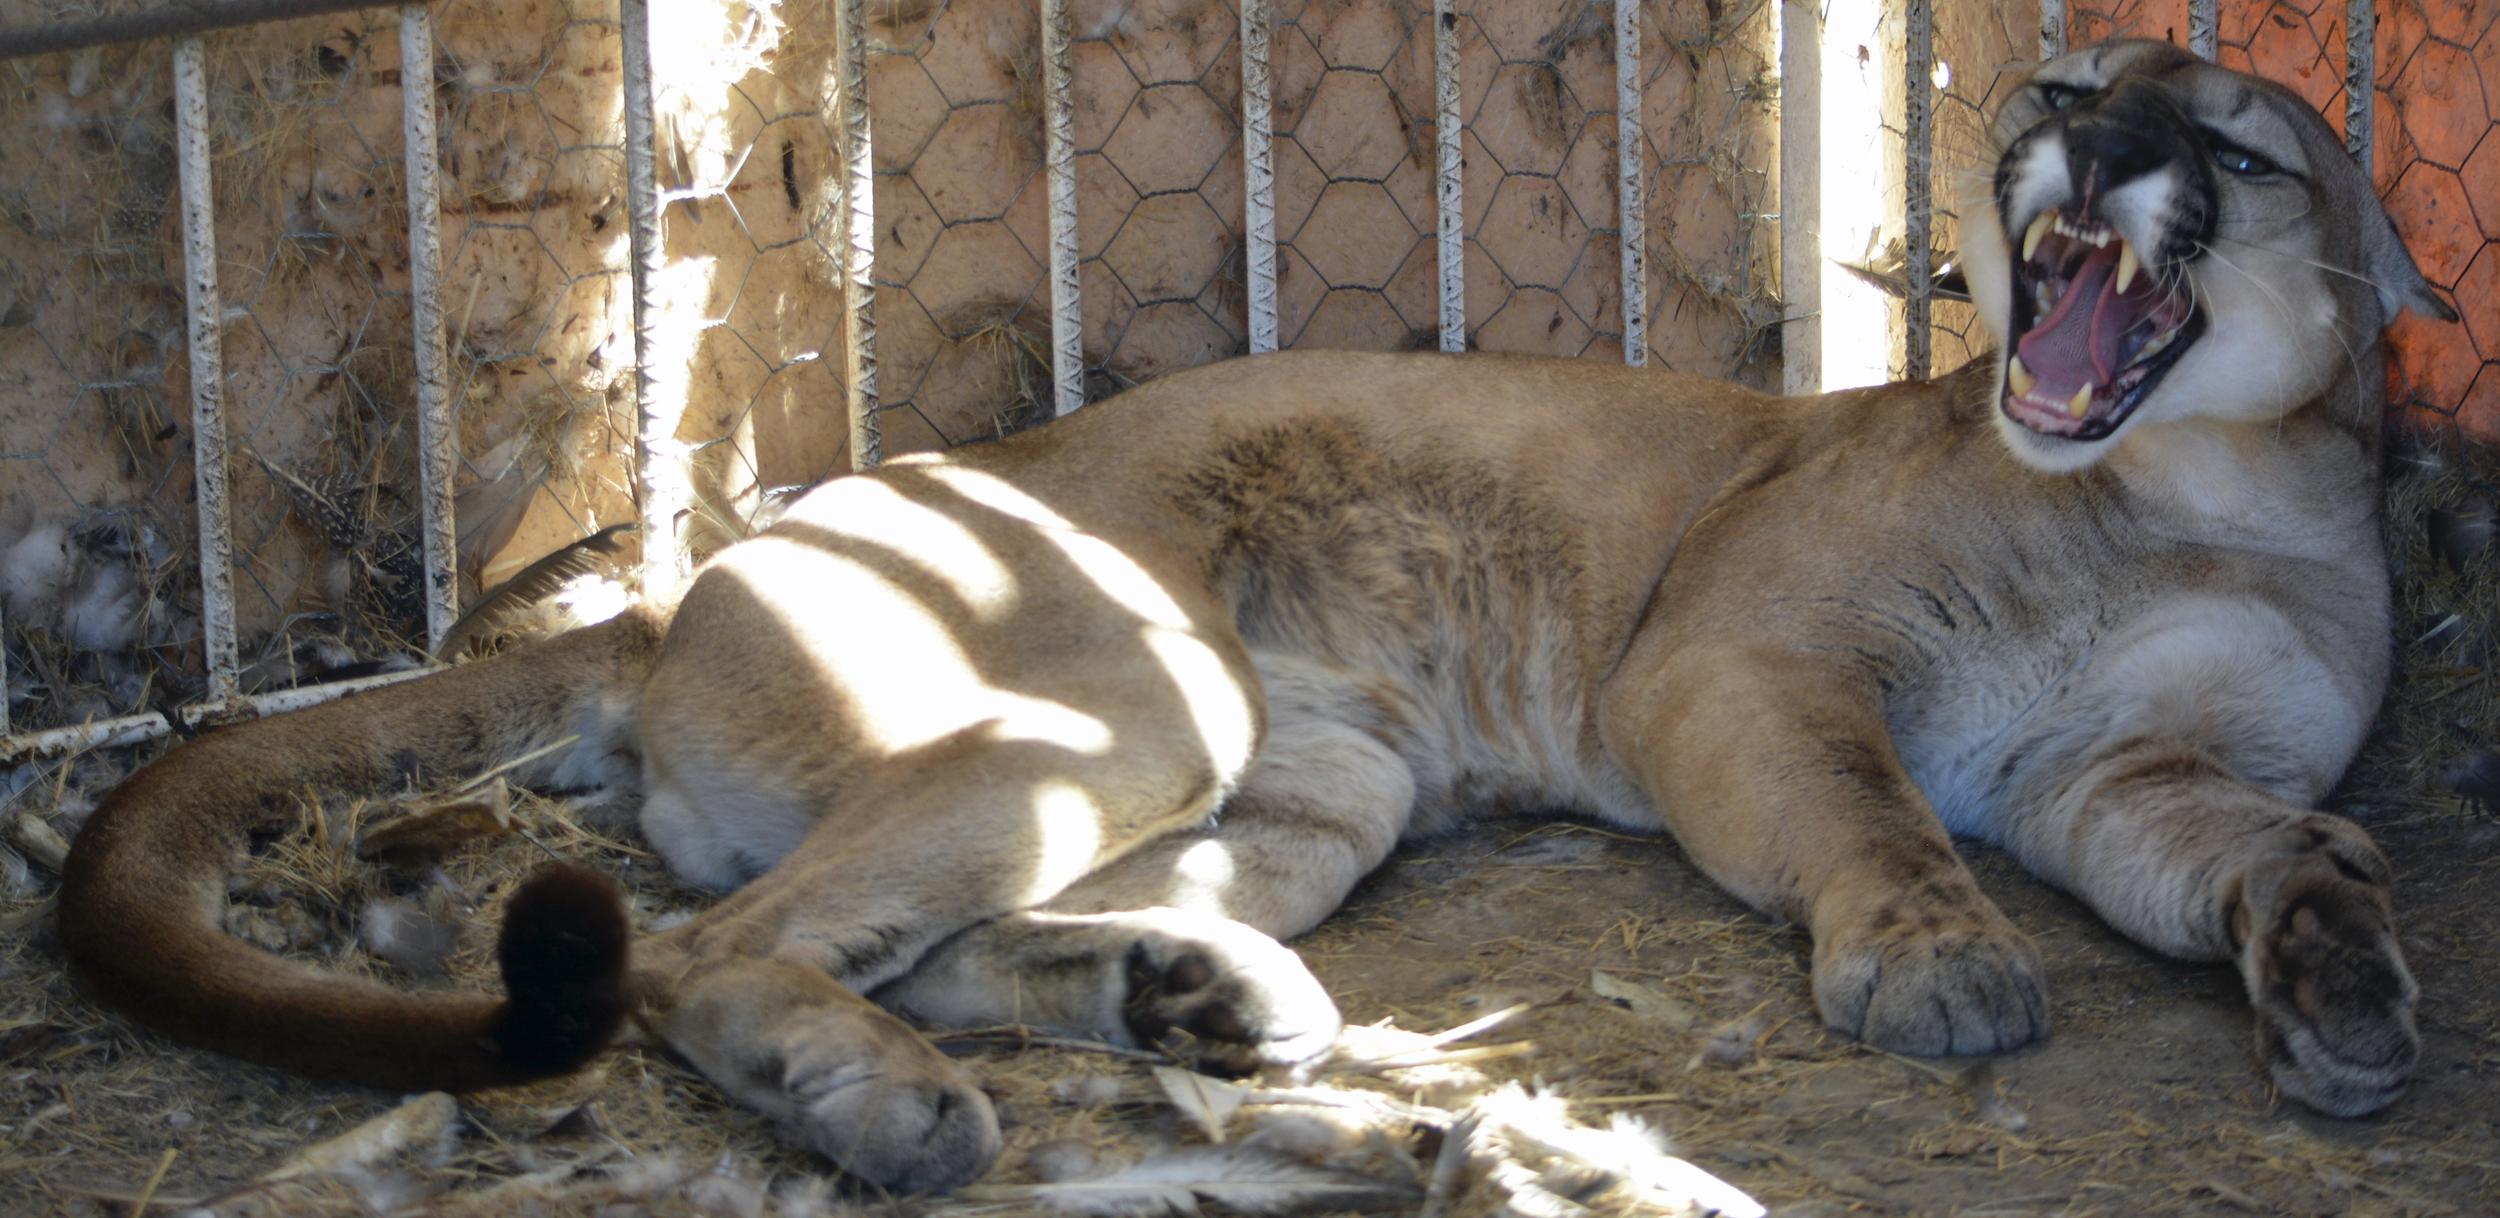 Puma macho adulto que apareció en una vivienda del barrio Magdalena de Cúcuta. Foto: Corponor.